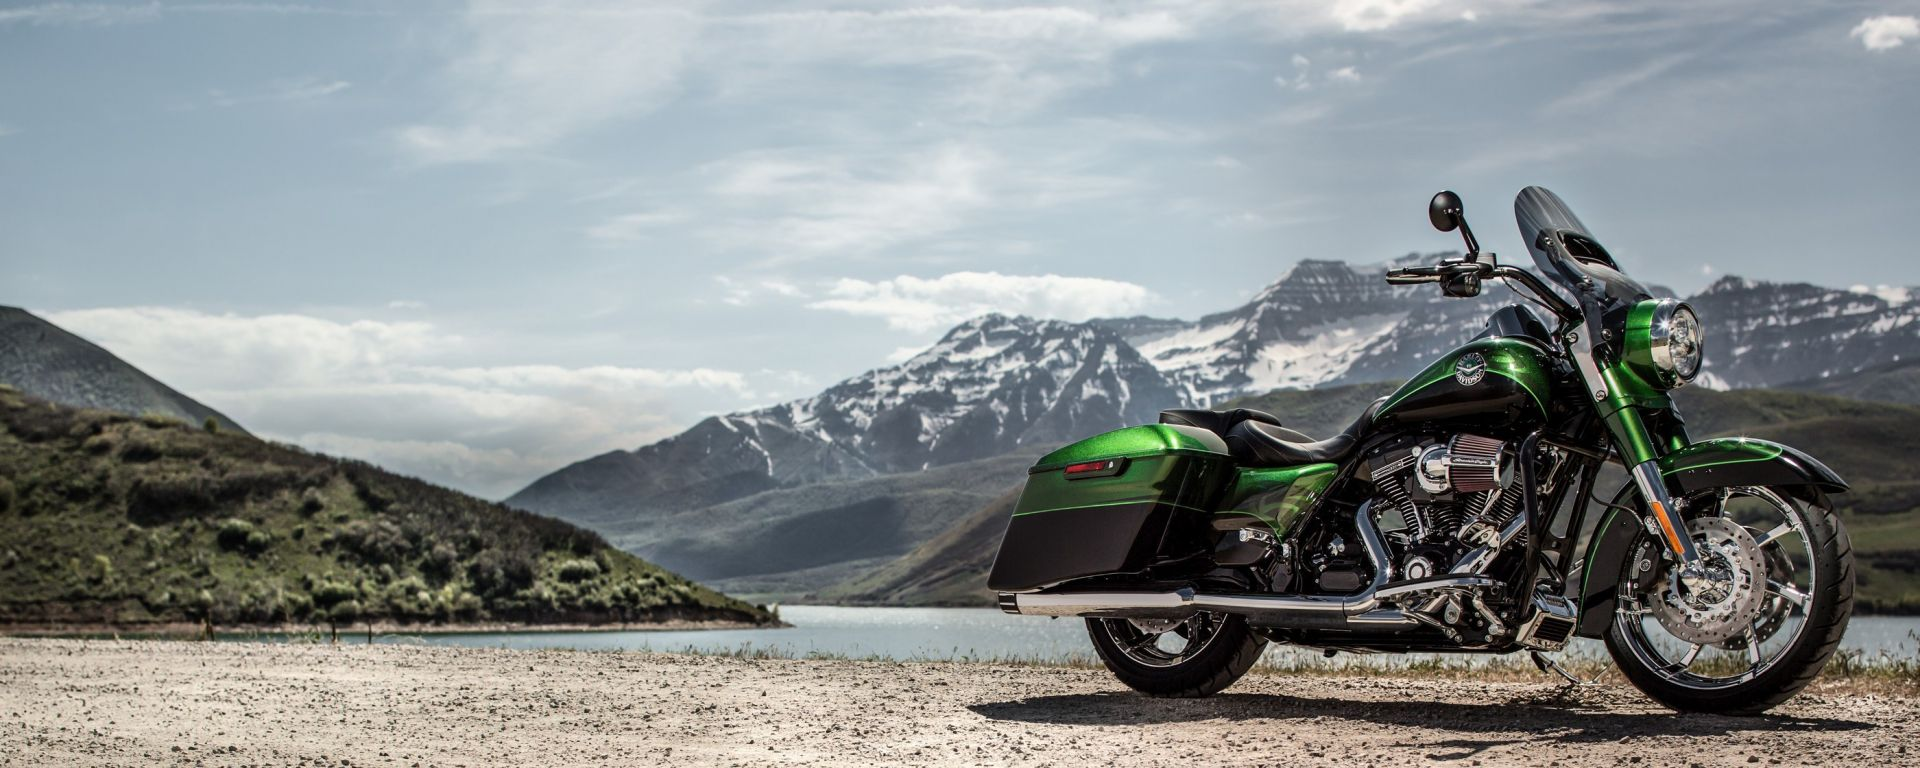 Harley-Davidson: 30 mila moto ai box